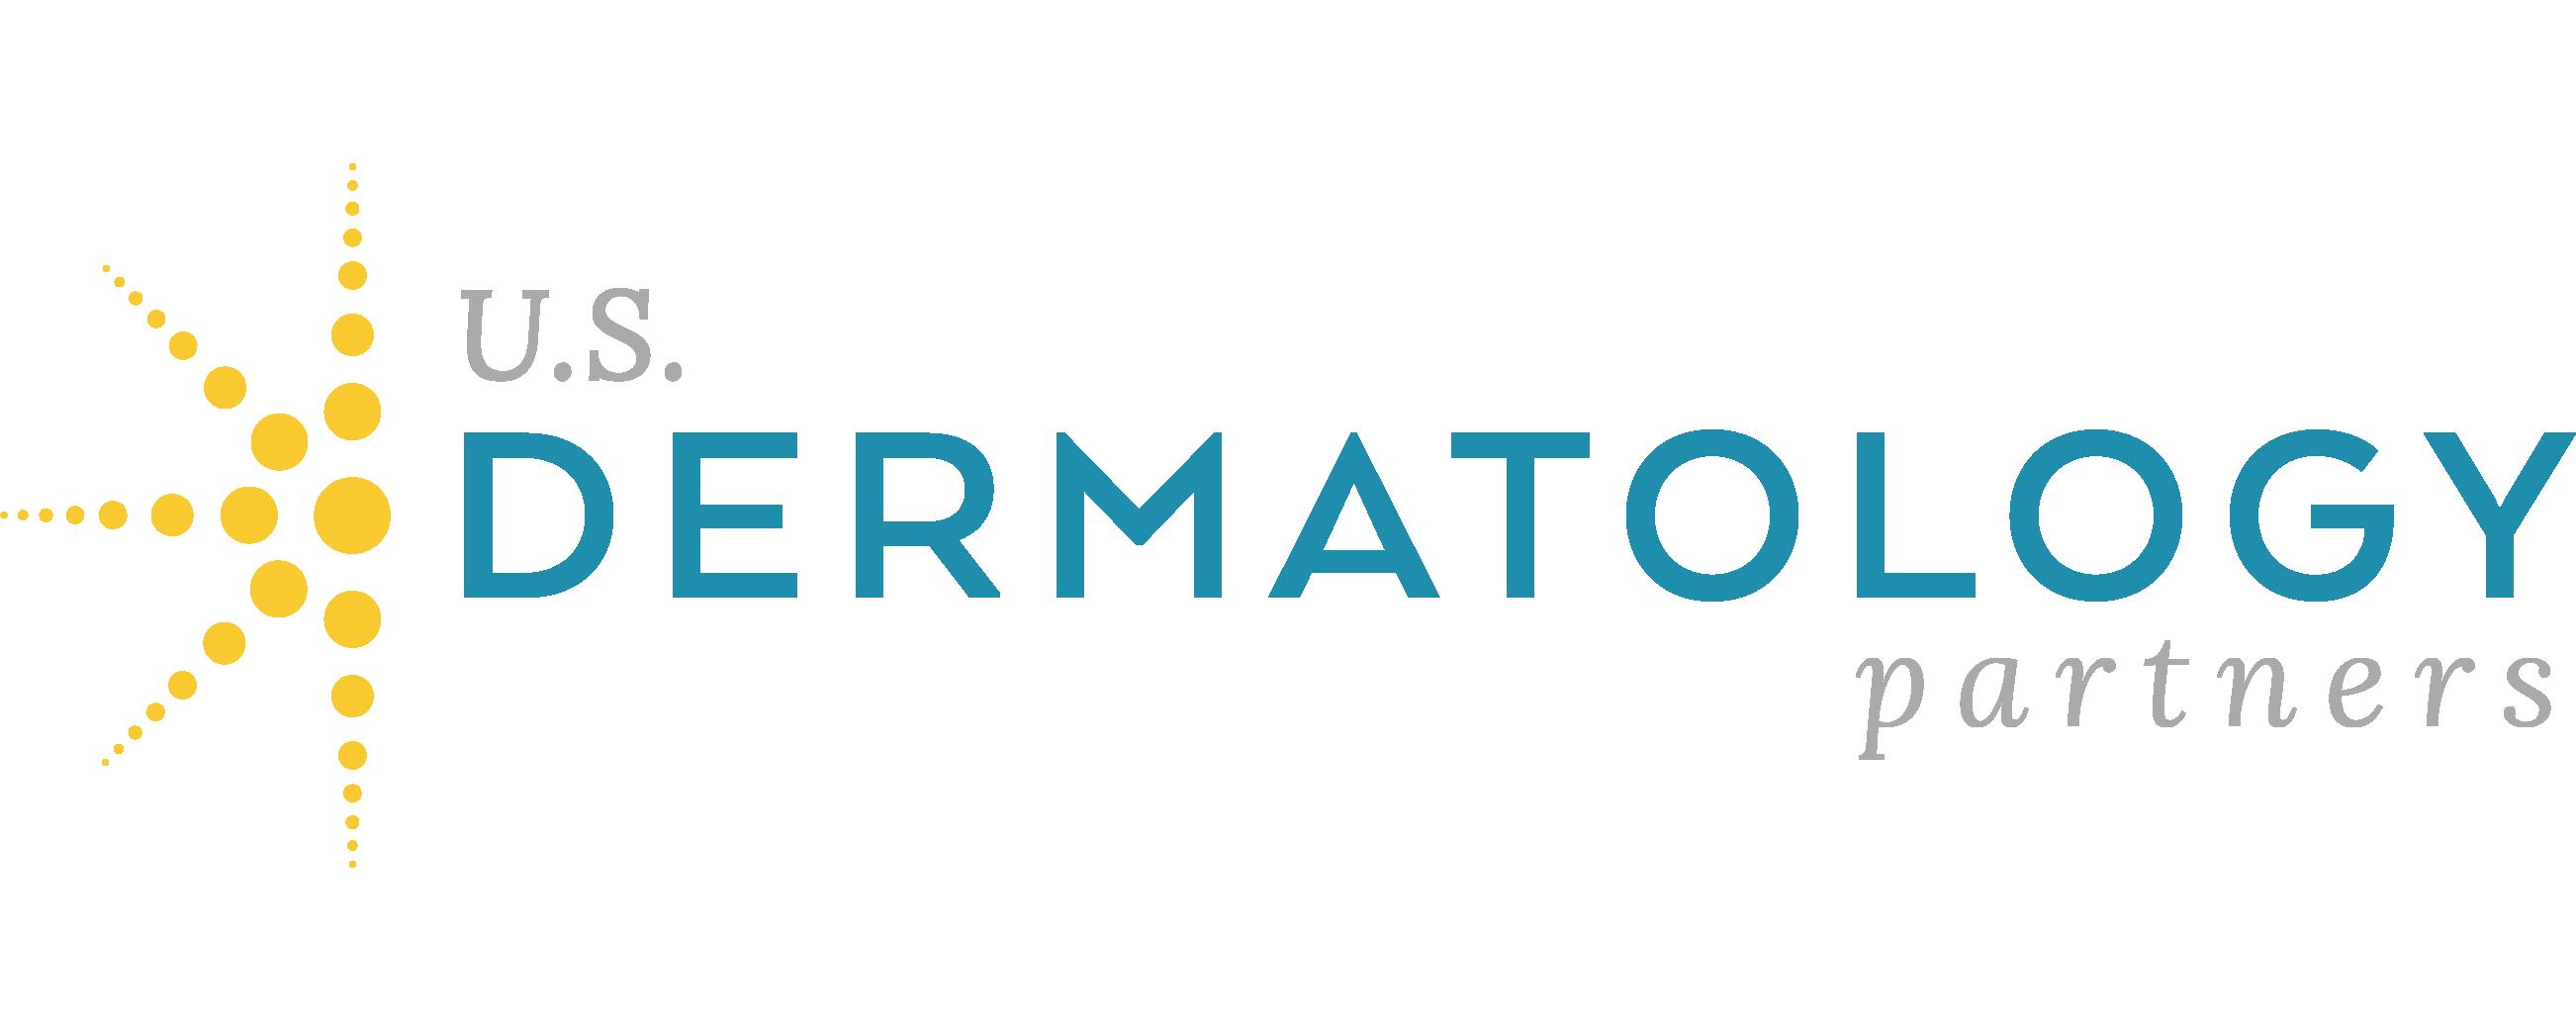 U.S. Dermatology Partners - Keller Logo